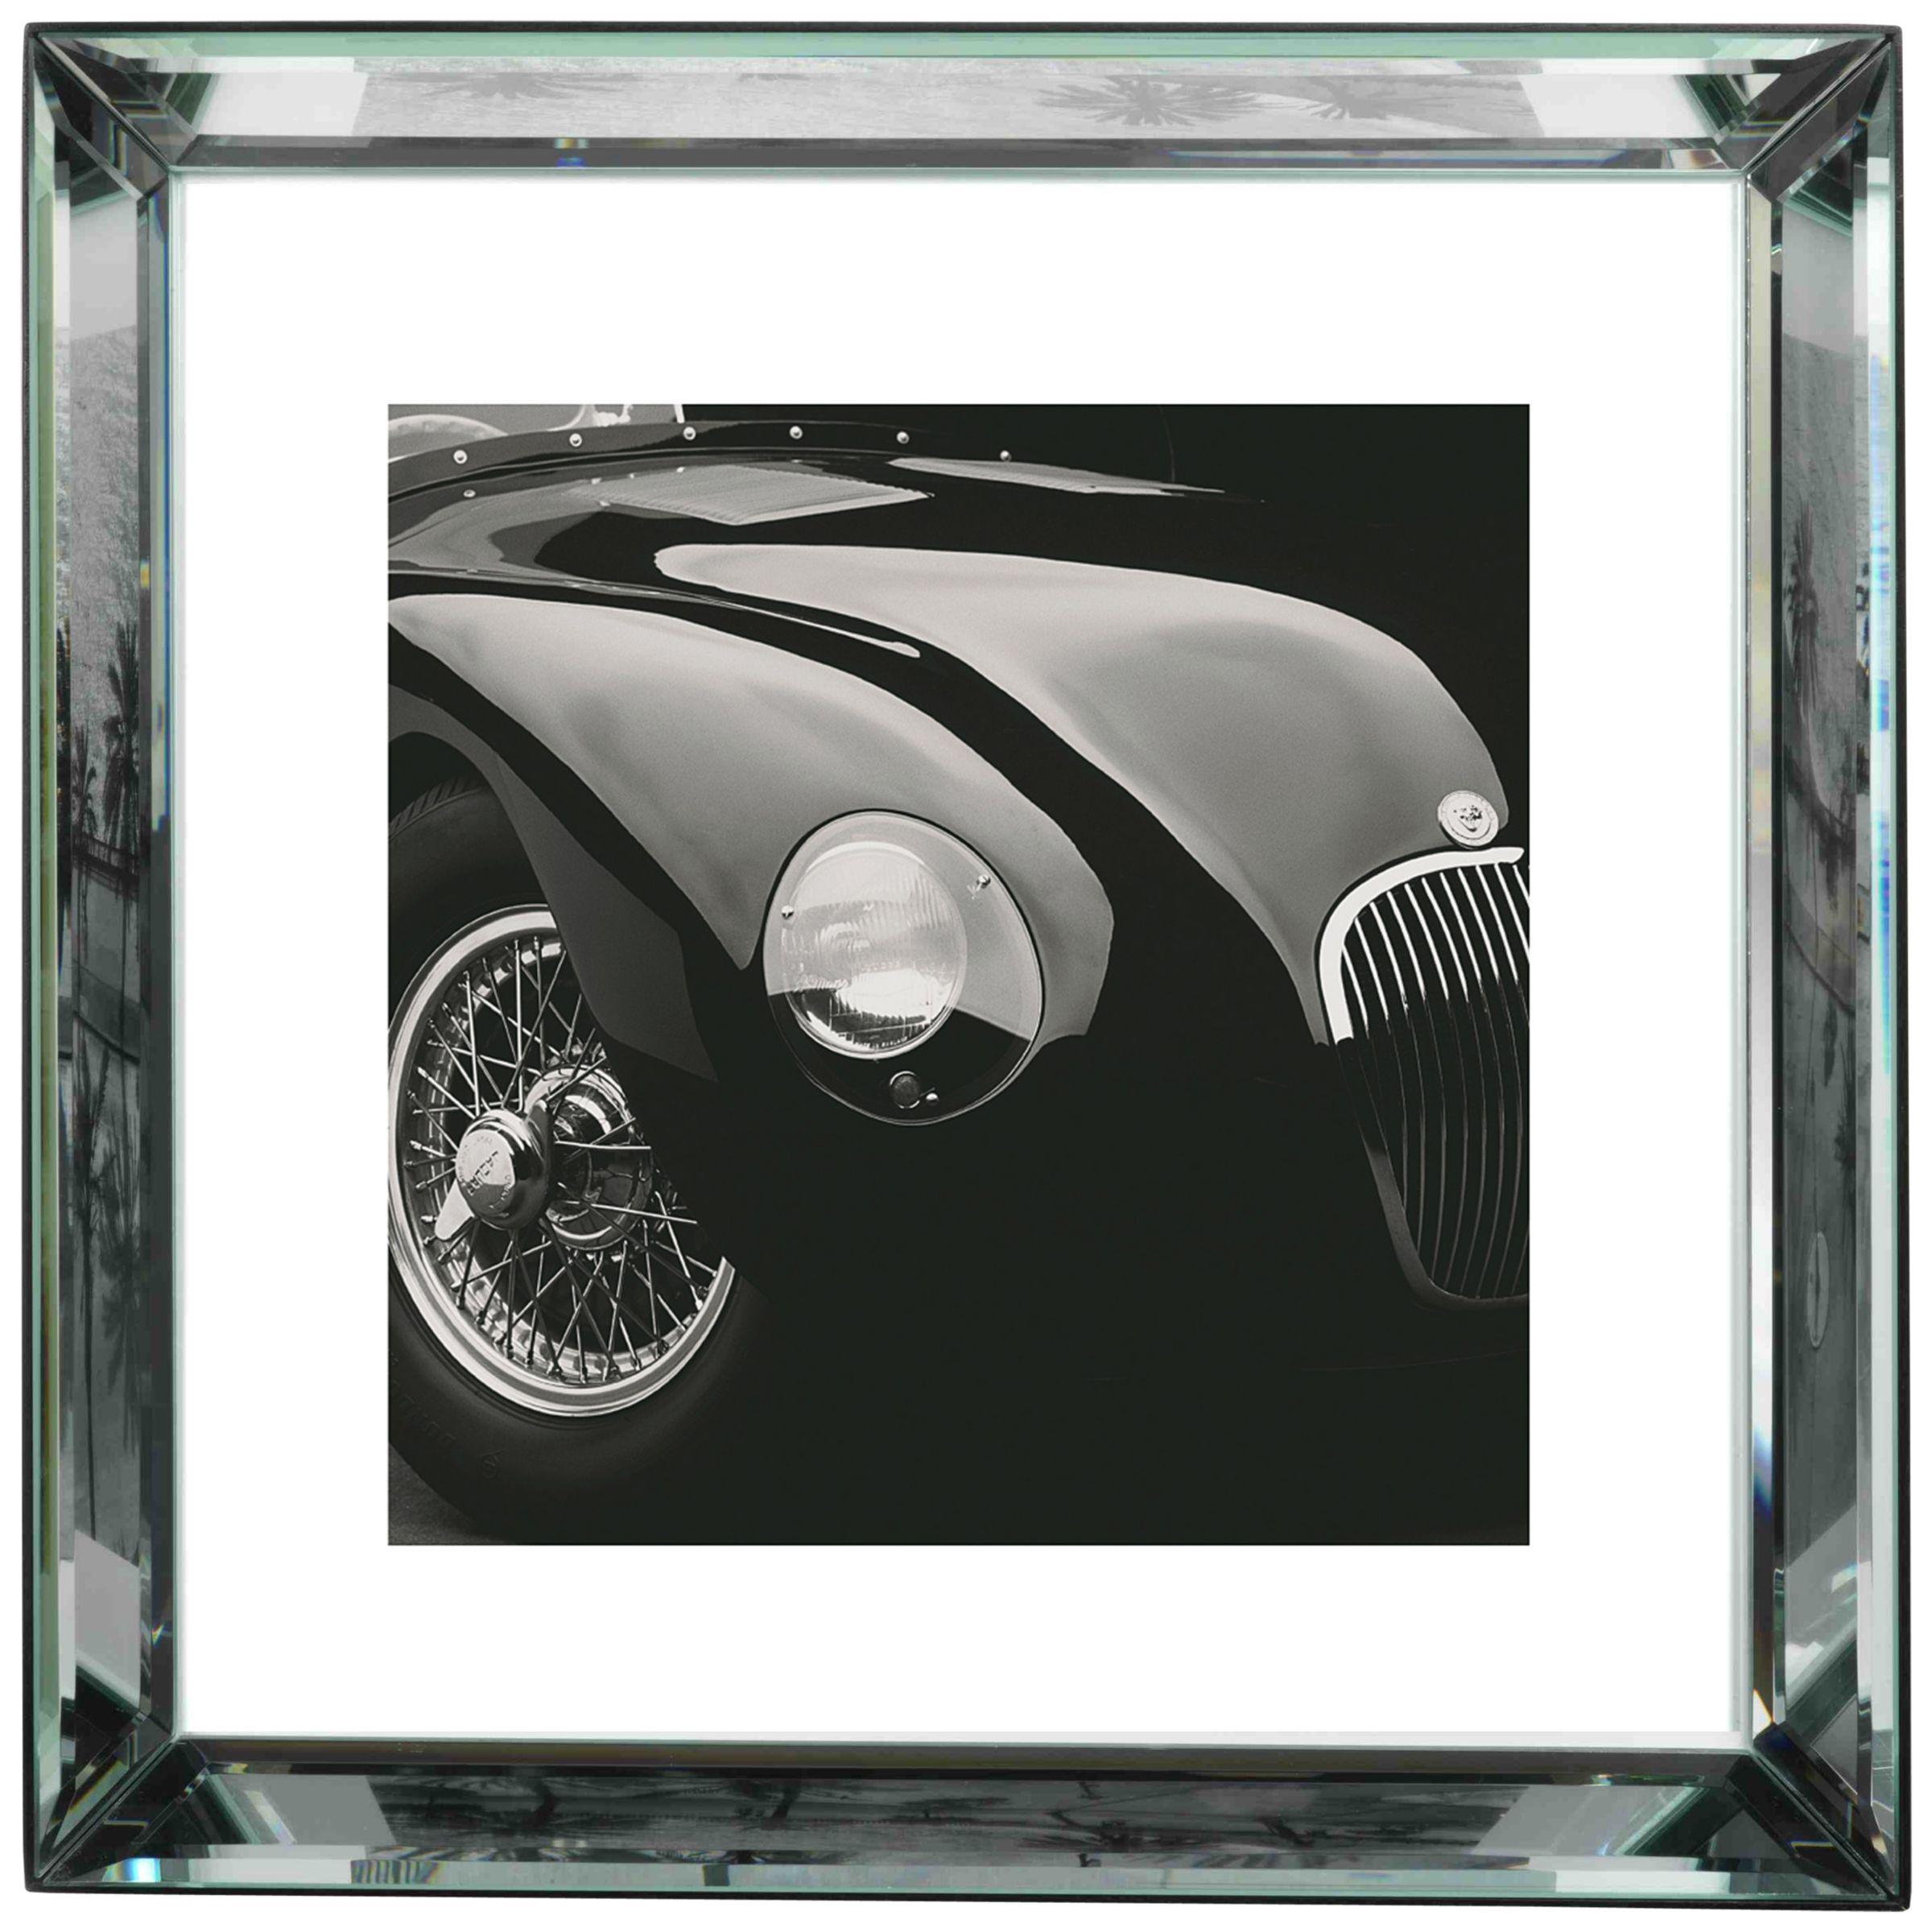 Brookpace Brookpace, The Manhattan Collection - Jaguar C-Type Framed Print, 57 x 57cm